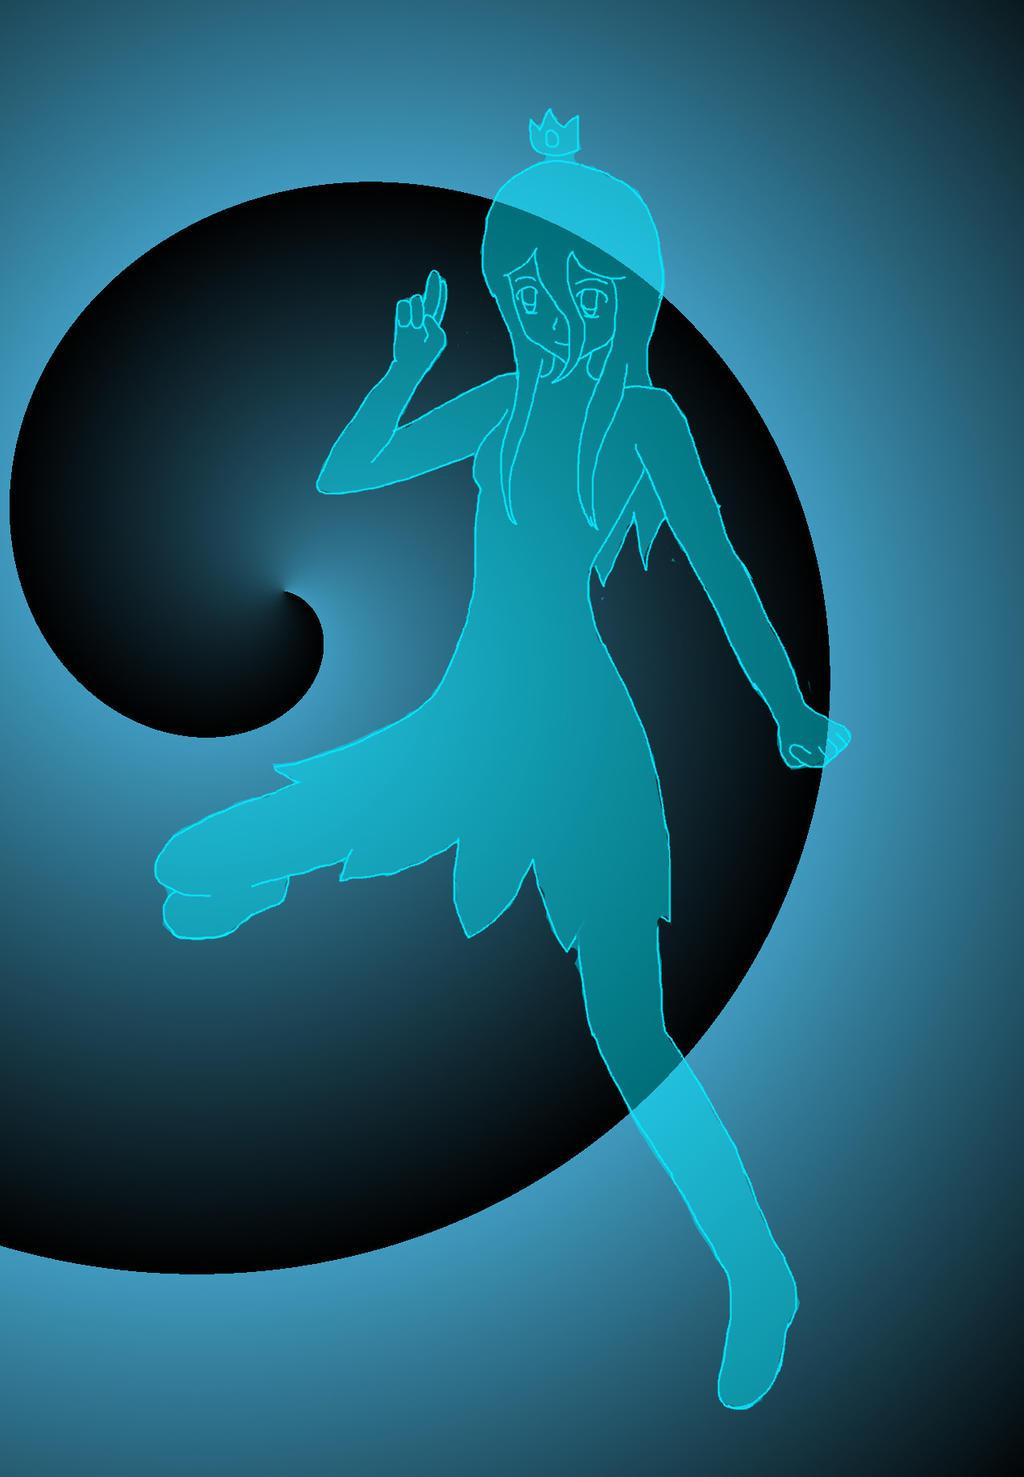 Ghost Princess by Sofiathefirst